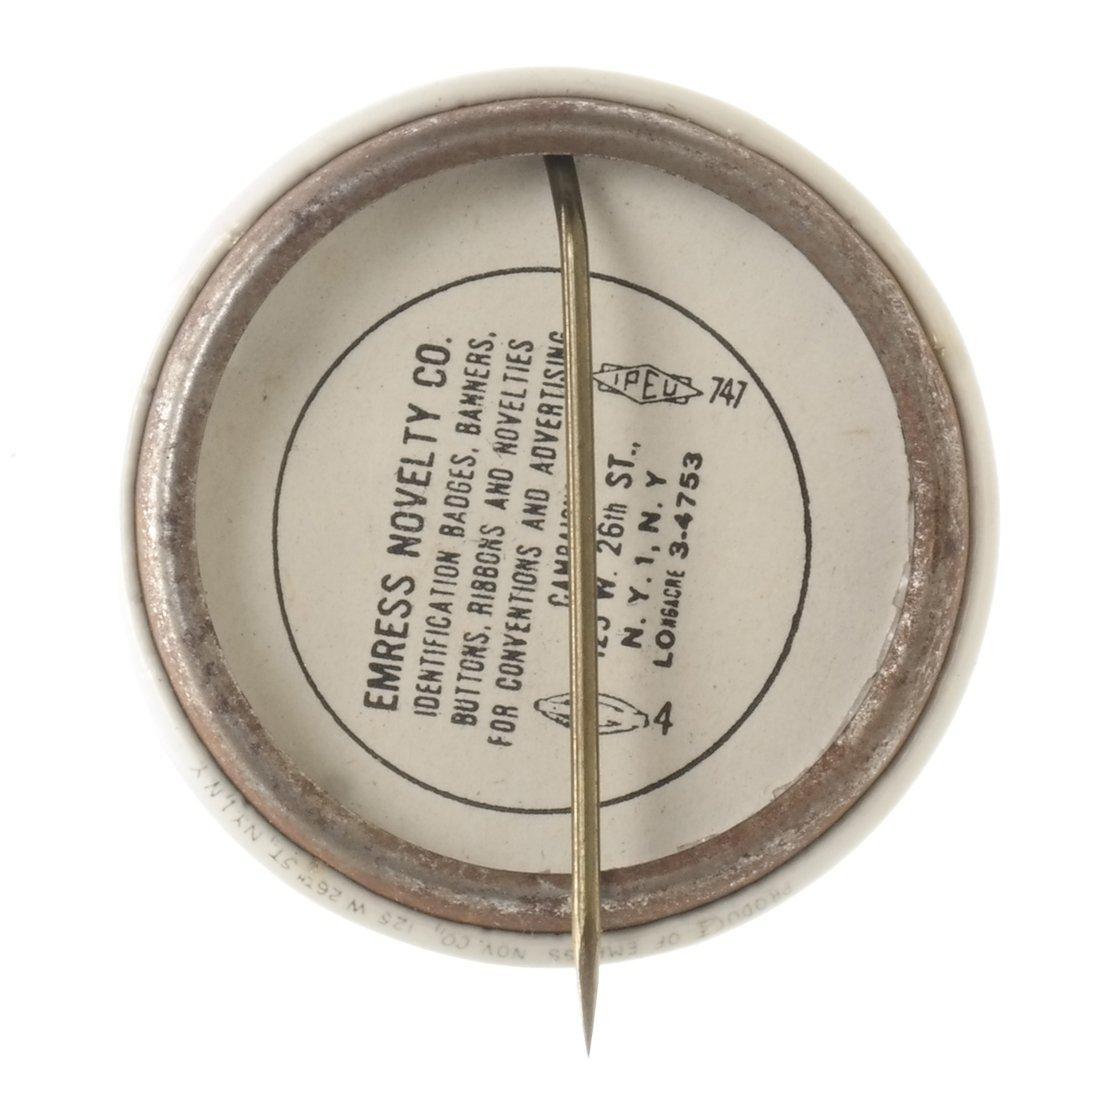 Truman & Barkley 'Black Star' Celluloid Button - 2